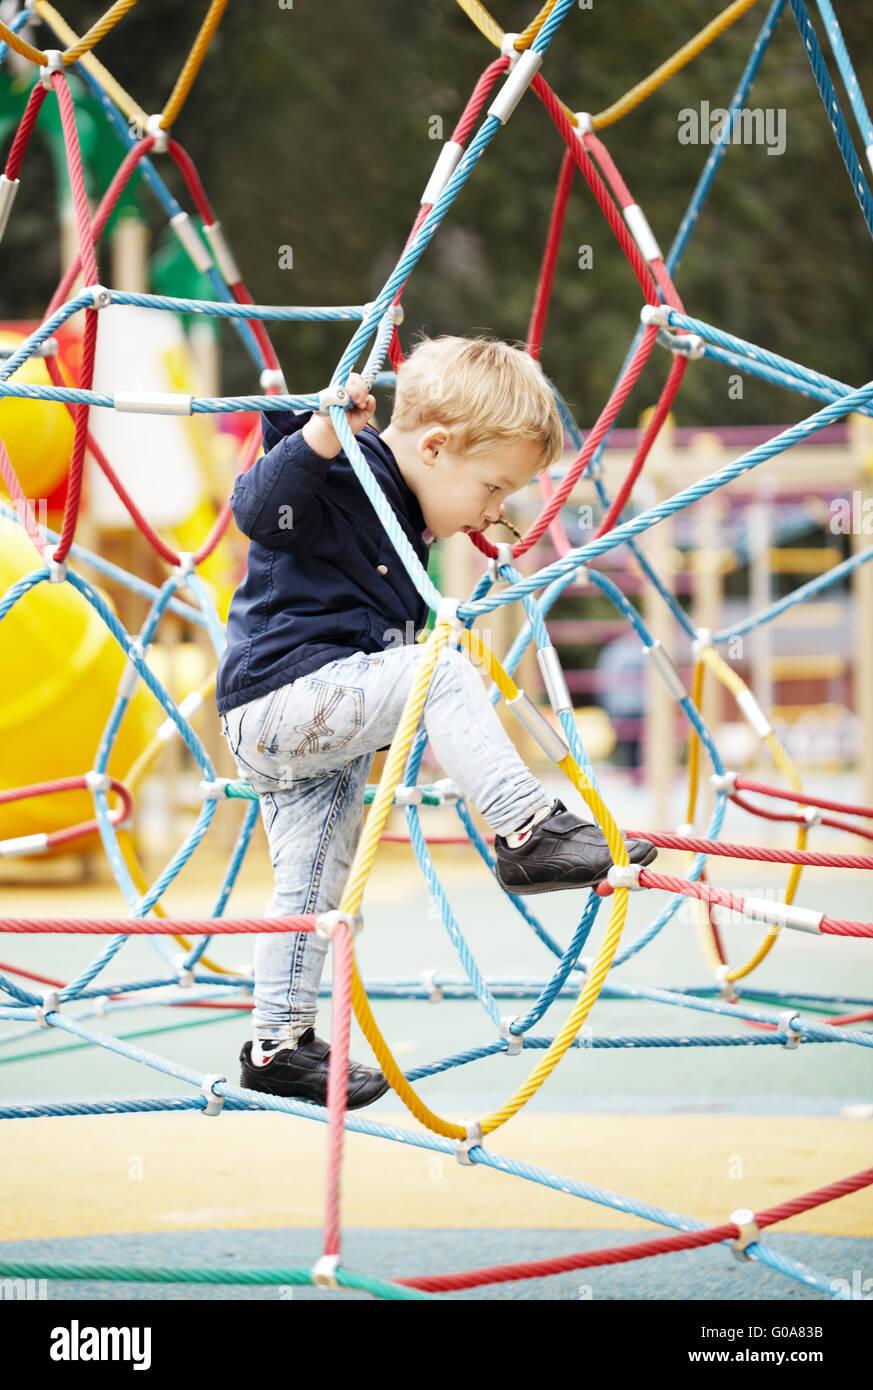 Happy little boy climbing on playground equipment - Stock Image